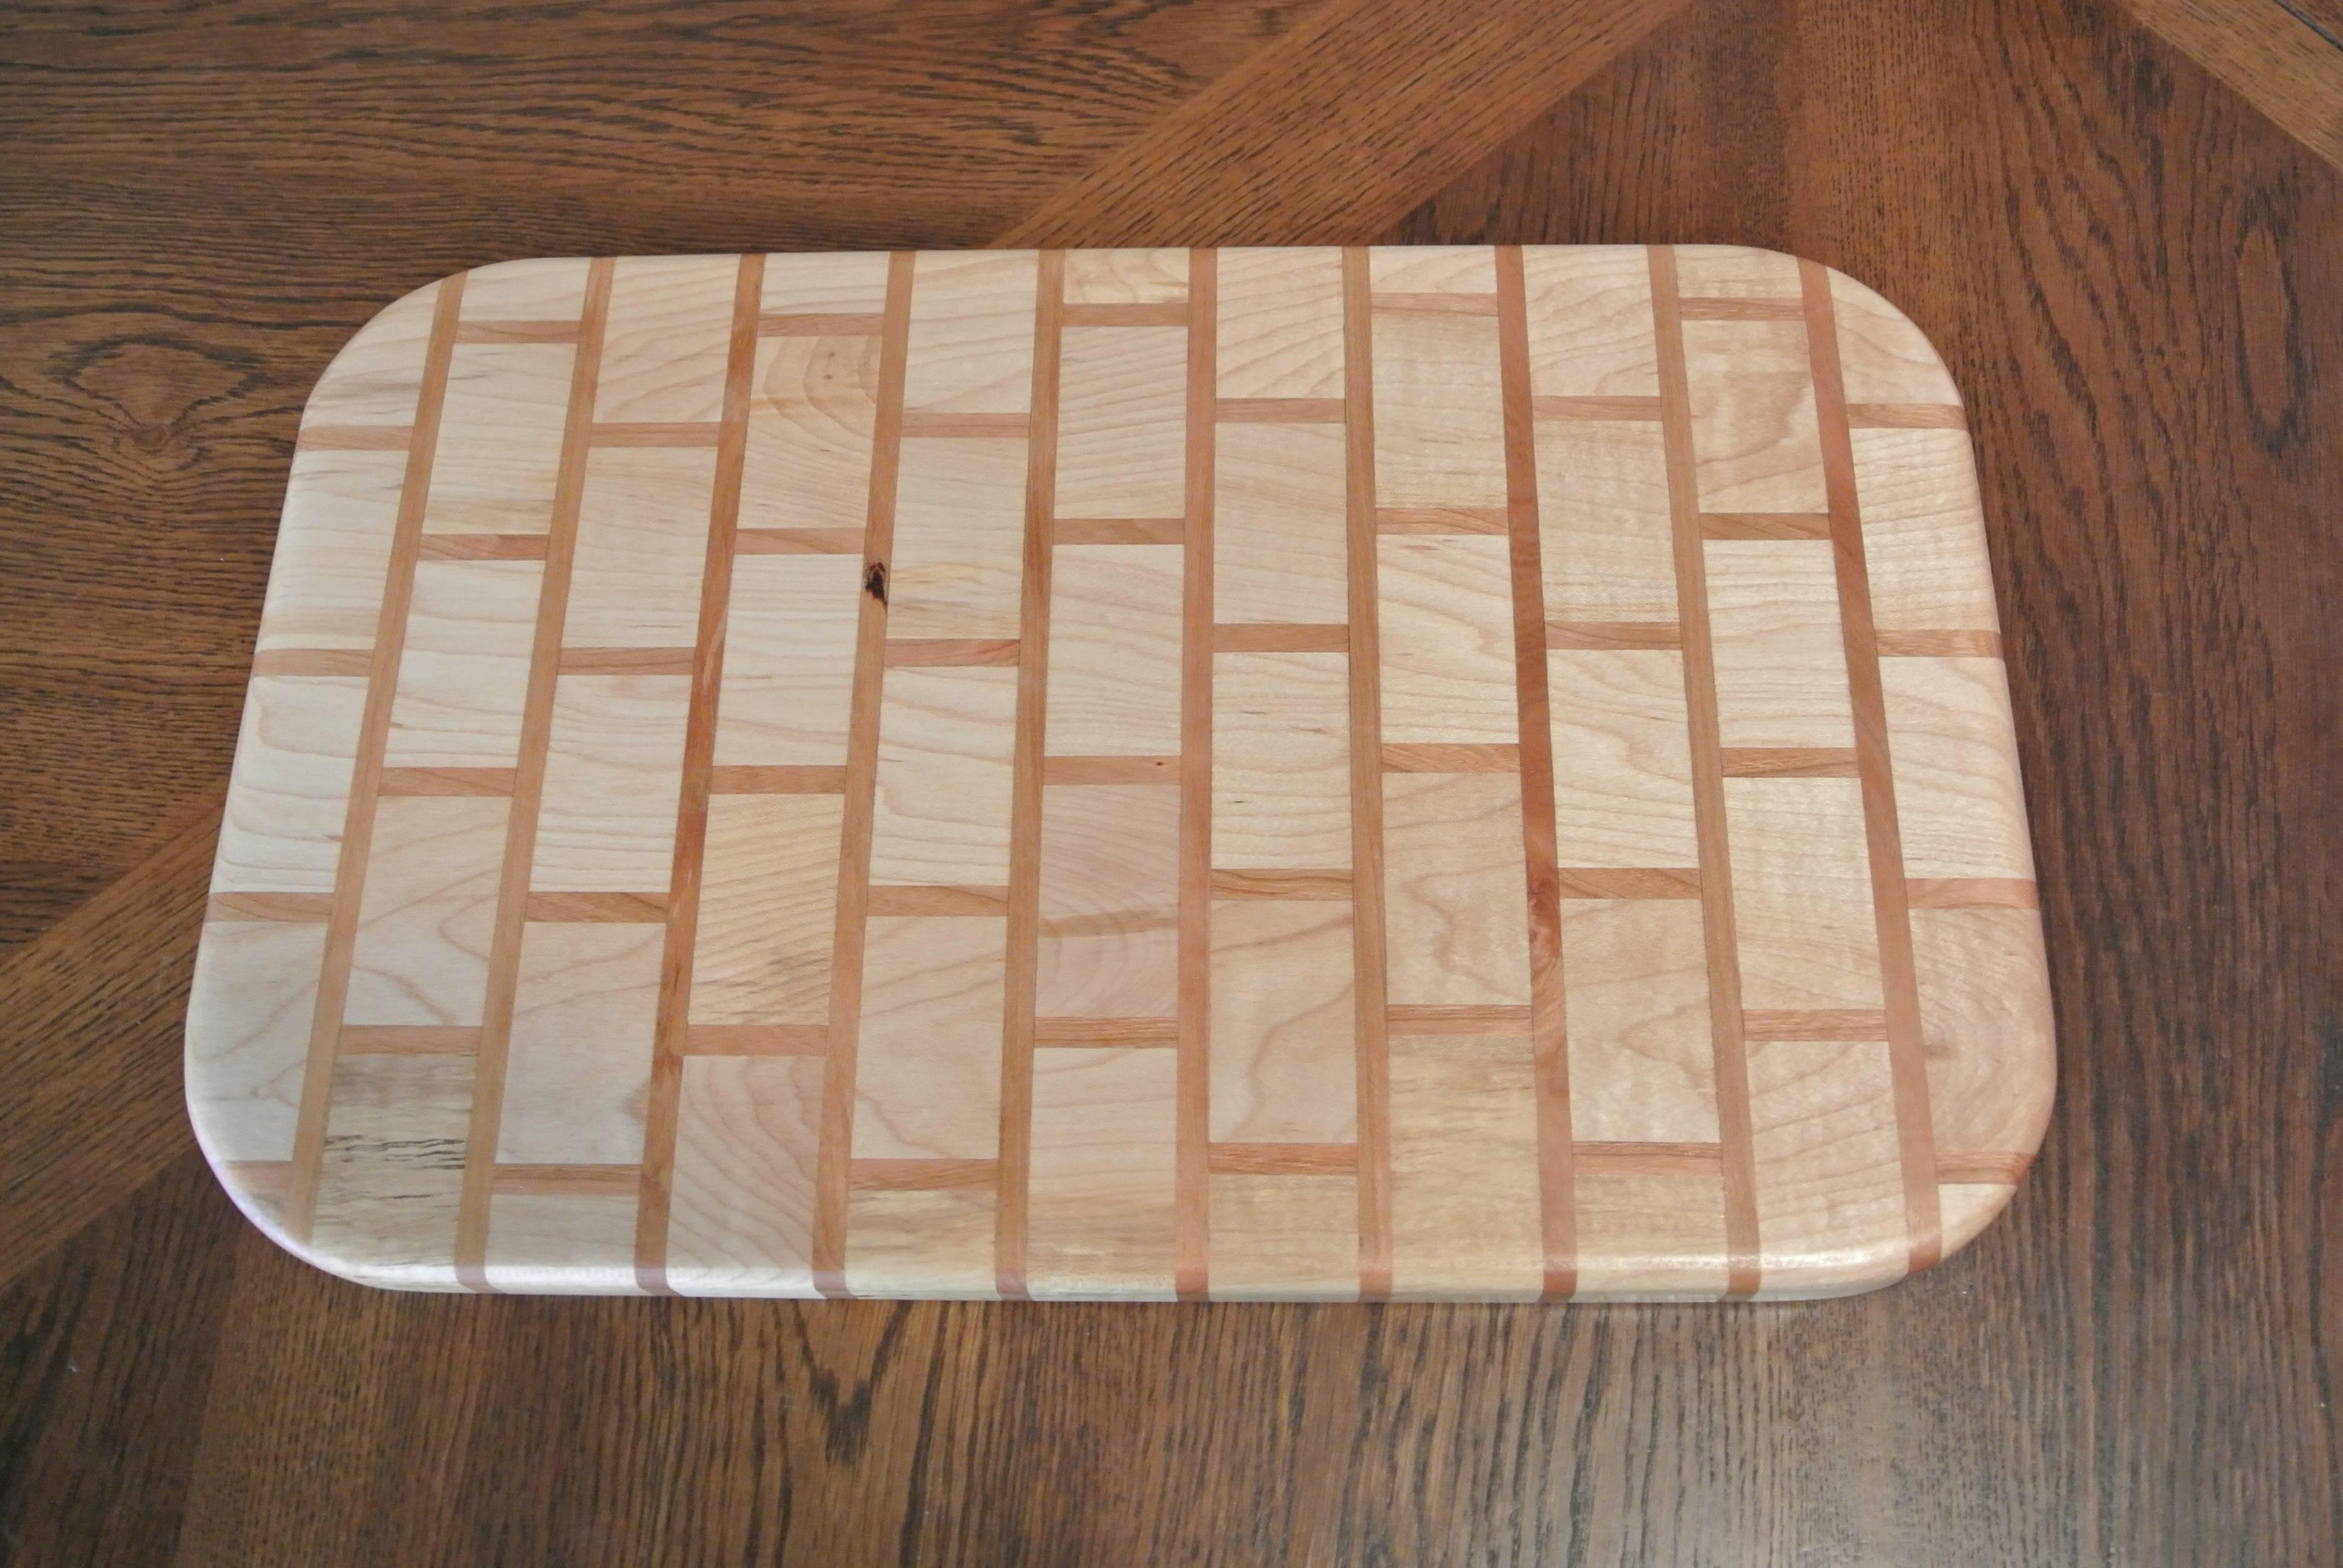 How To Make A Brick Pattern Cutting Board